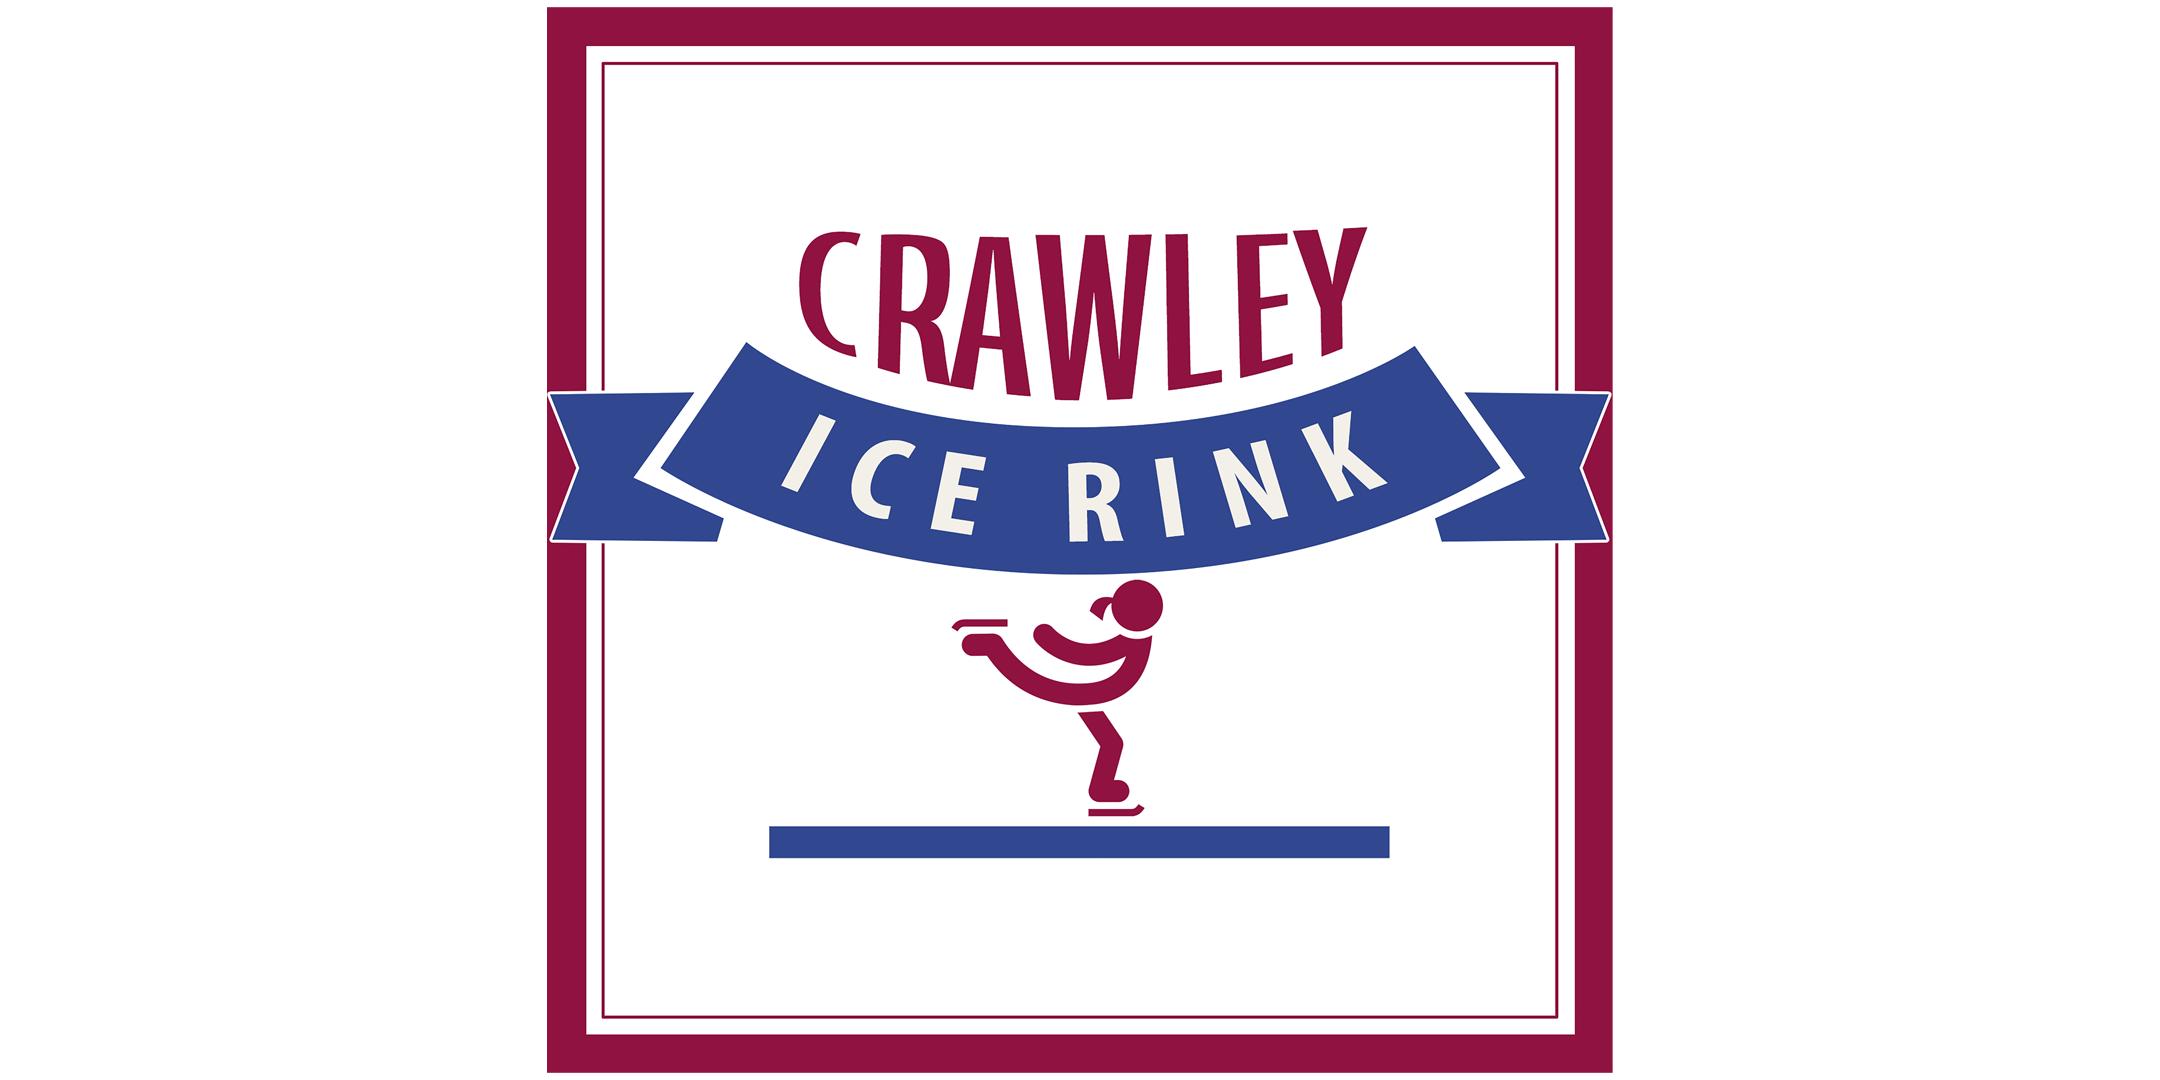 Crawley Ice Rink - 6th January (Peak)